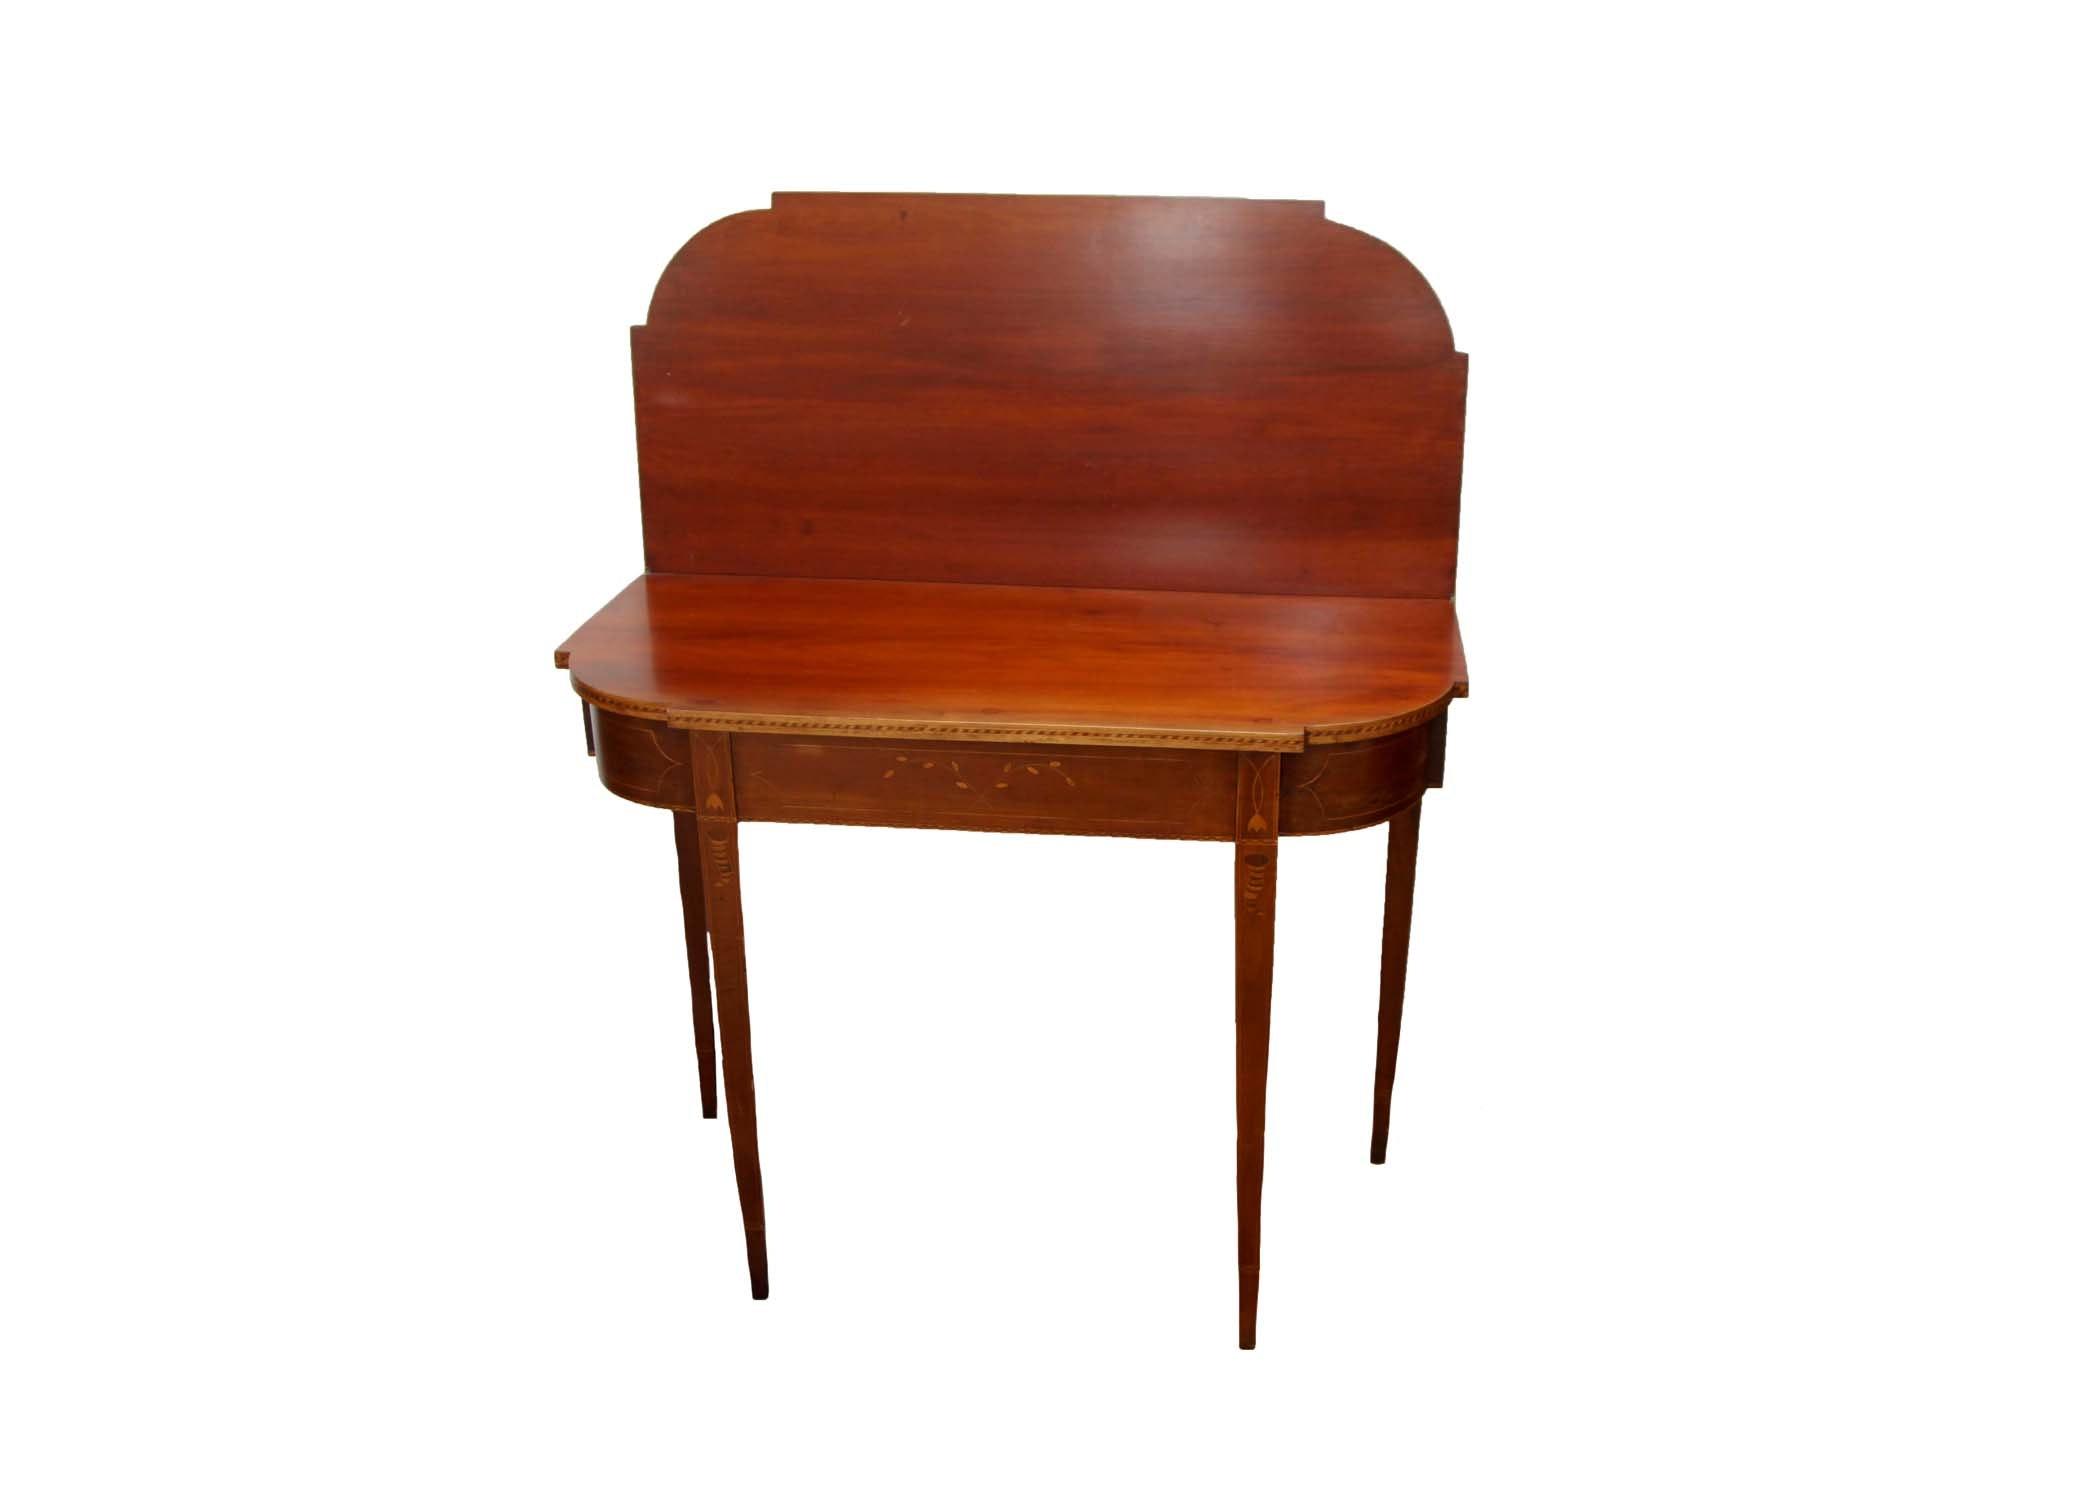 An Antique Flip Top Table